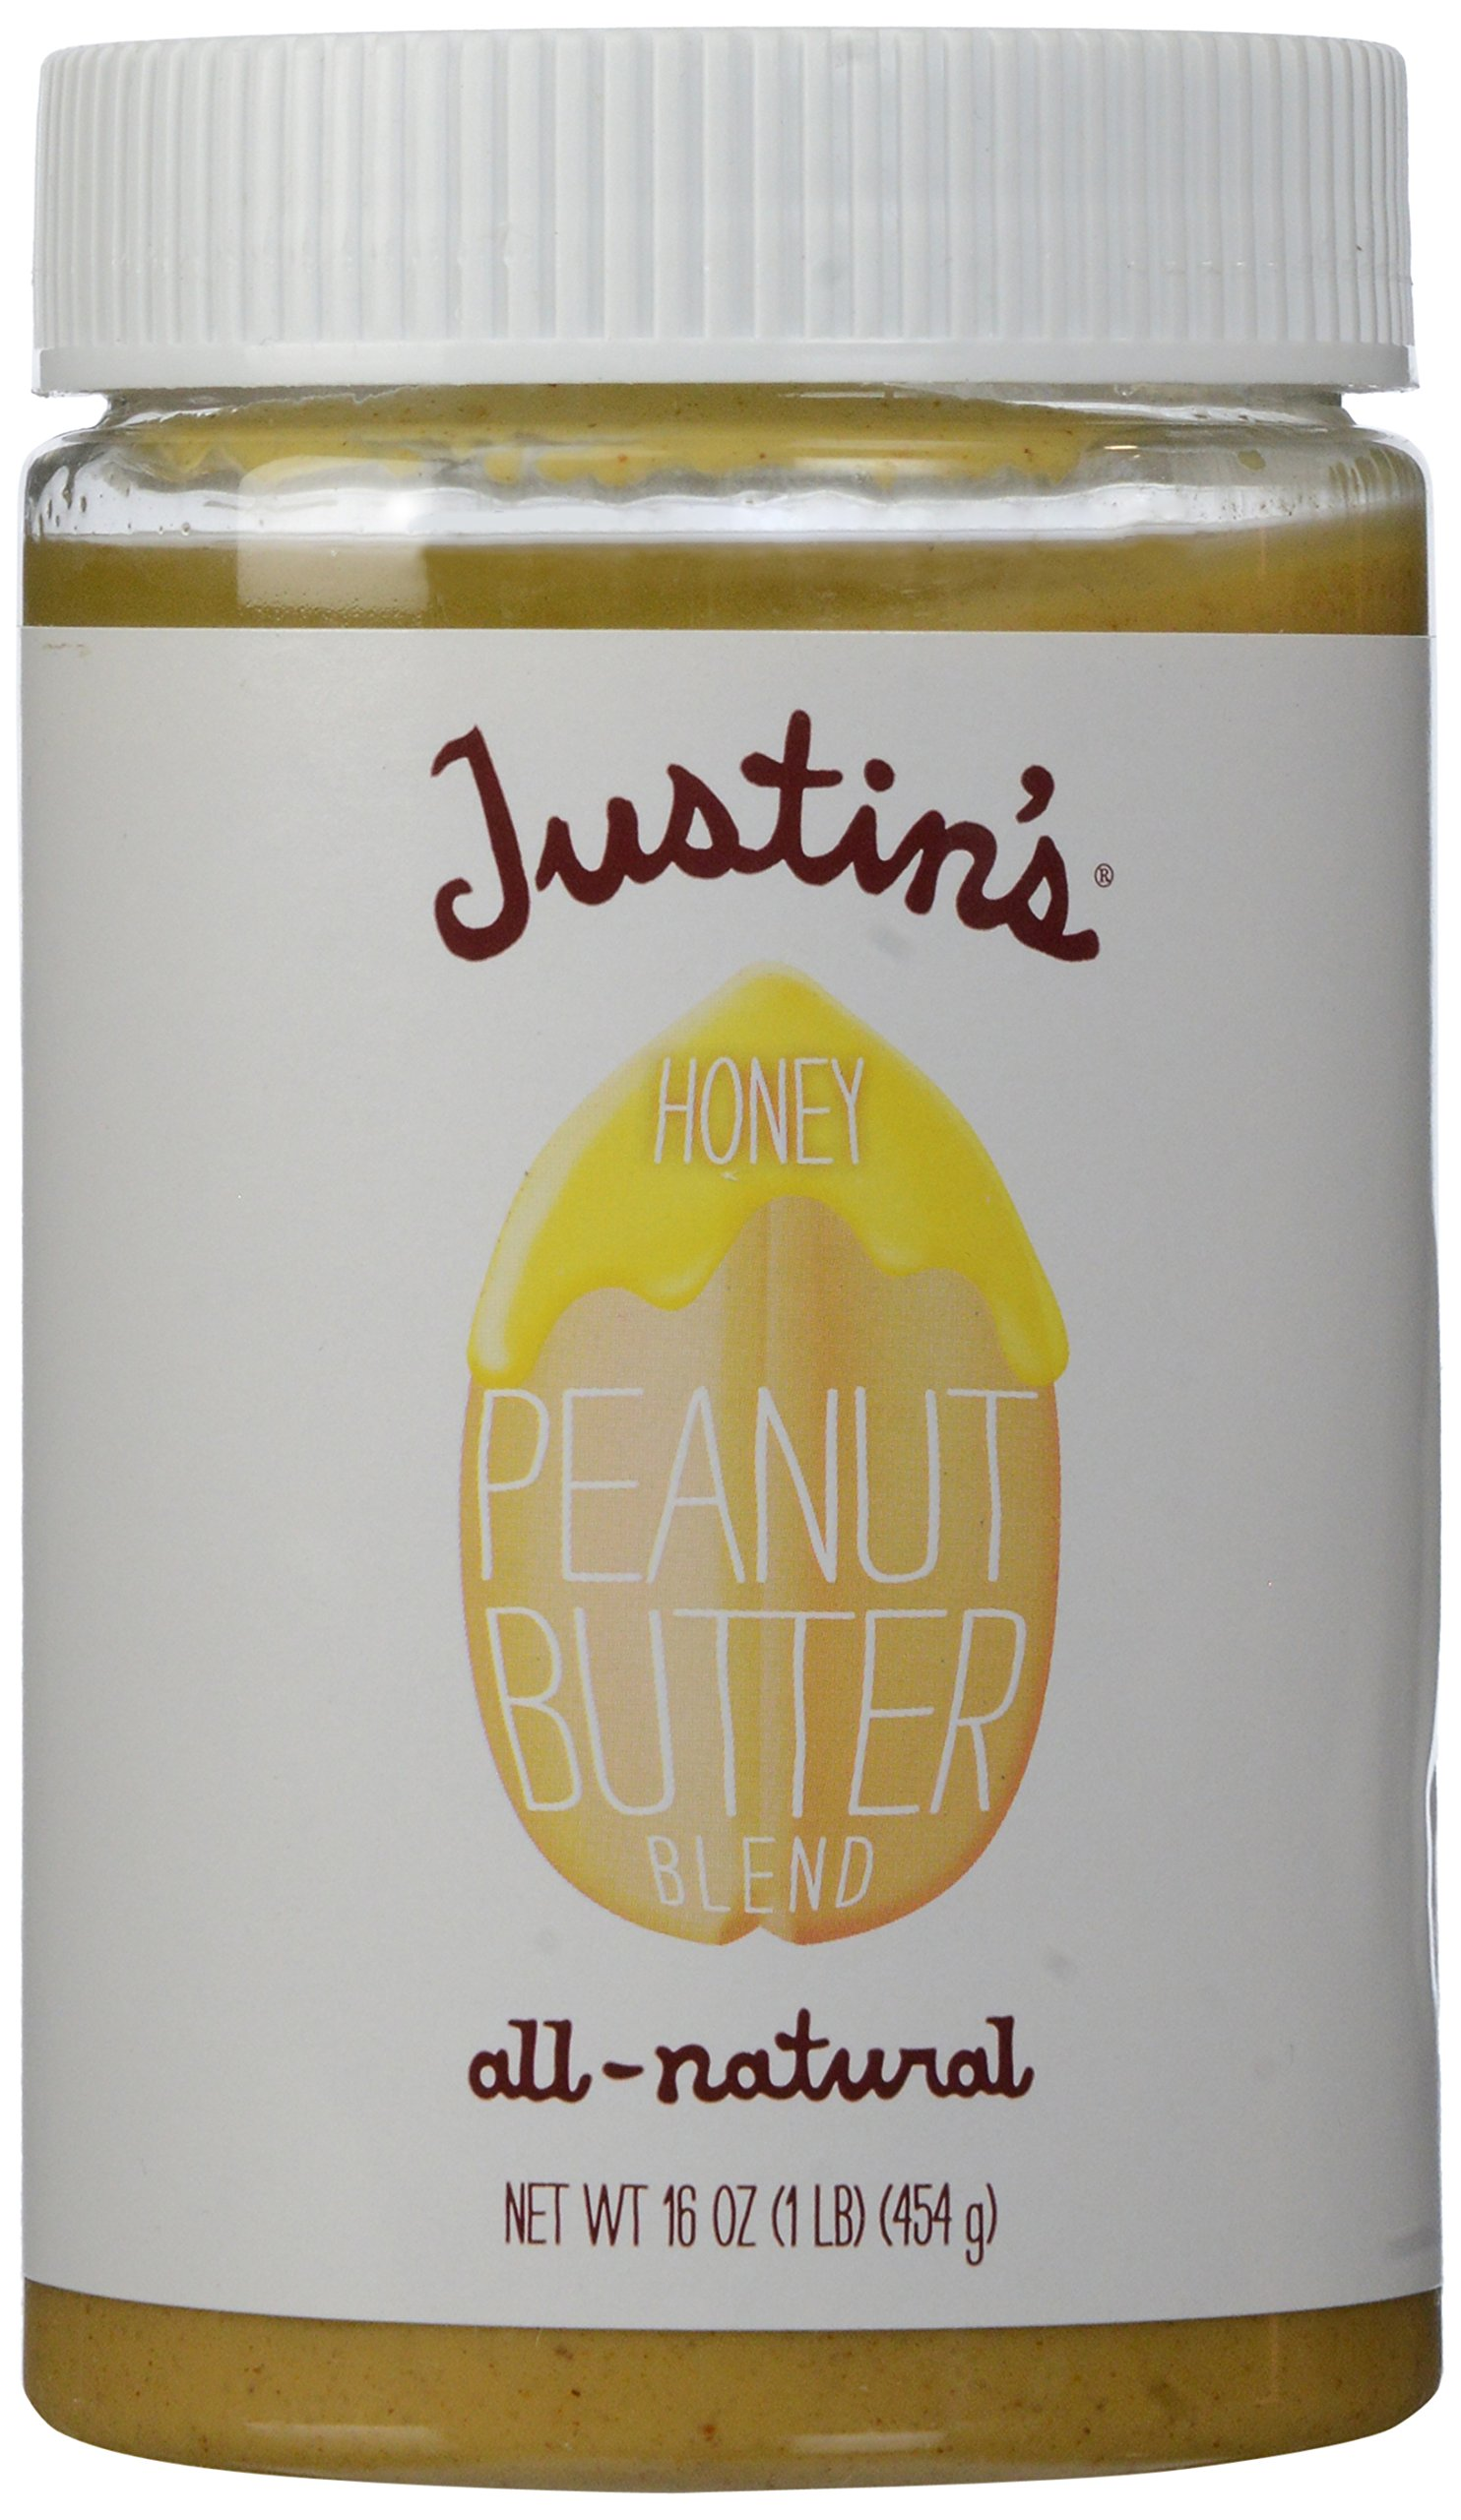 Justin's Nut Butter Honey Classic Peanut Butter, 16 oz